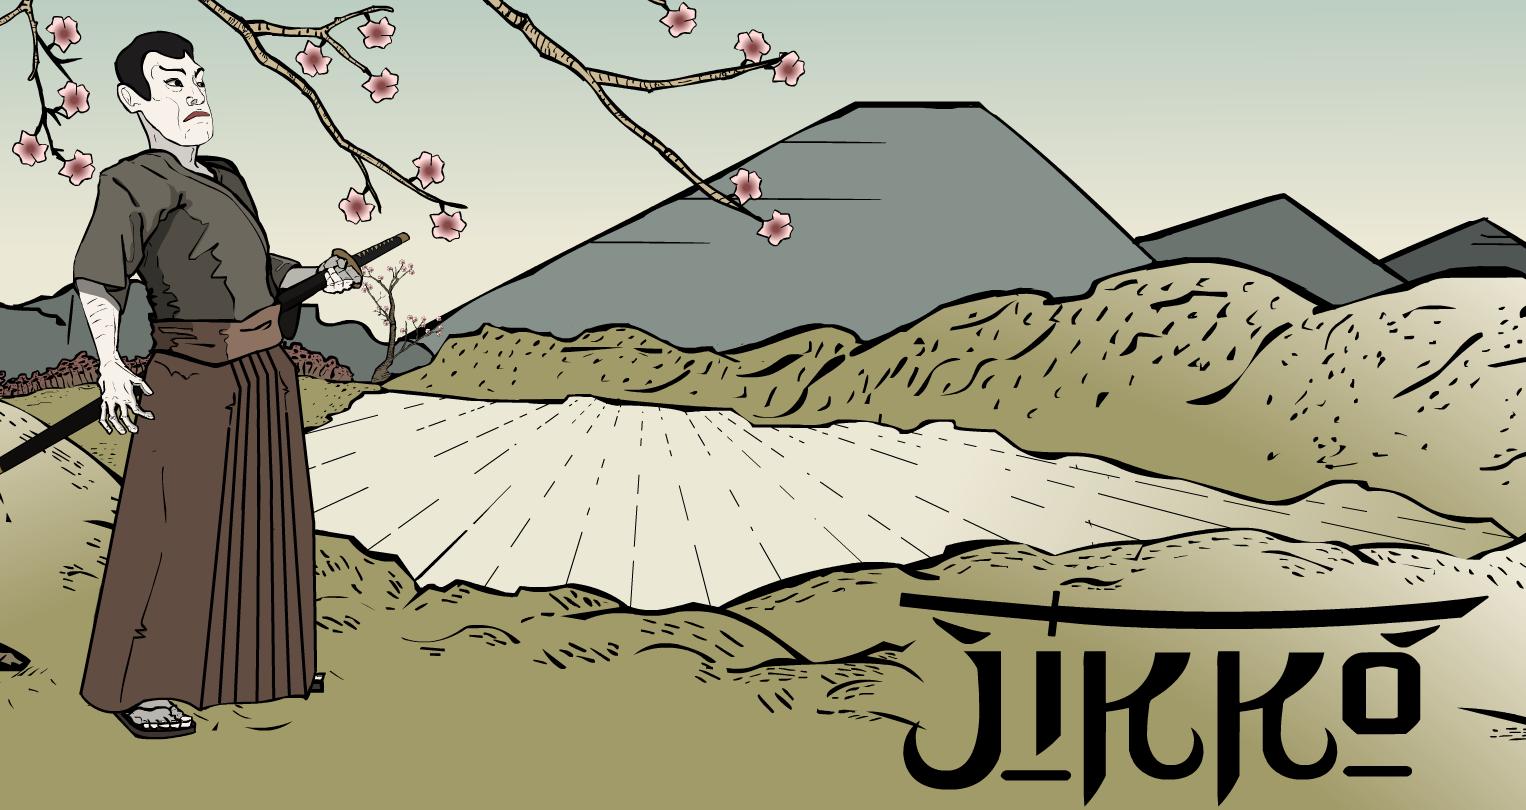 Jikko